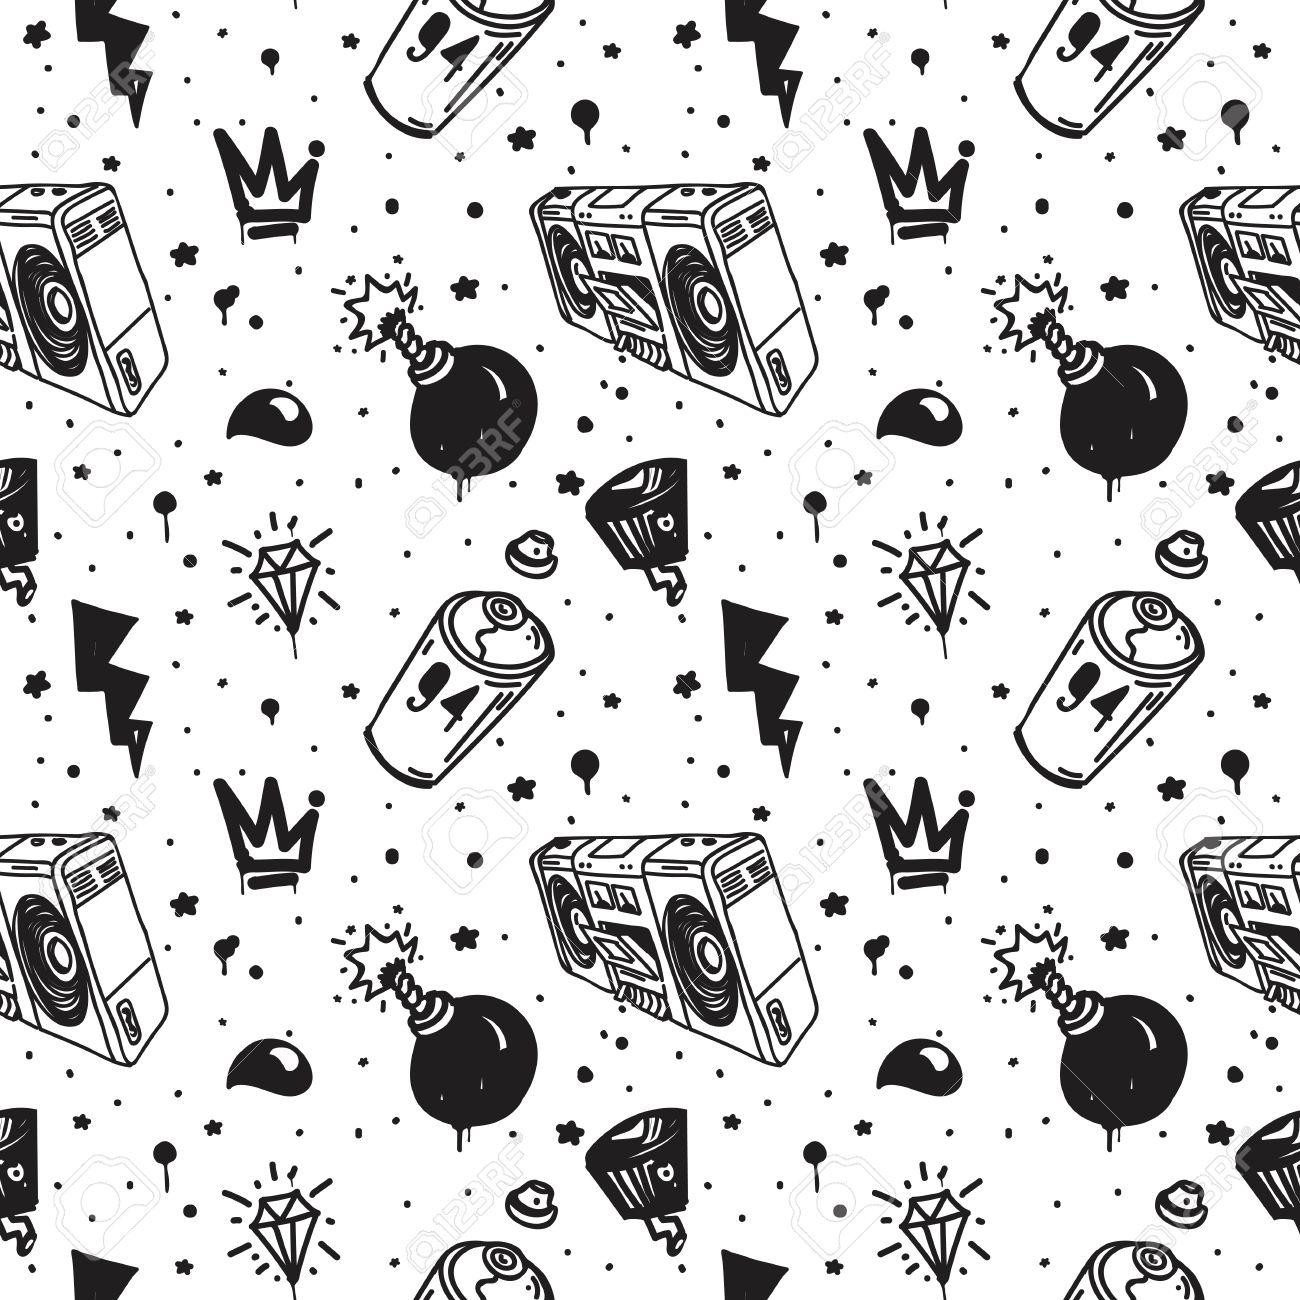 graffiti black graphic spray can cartoon doodle sketch grunge